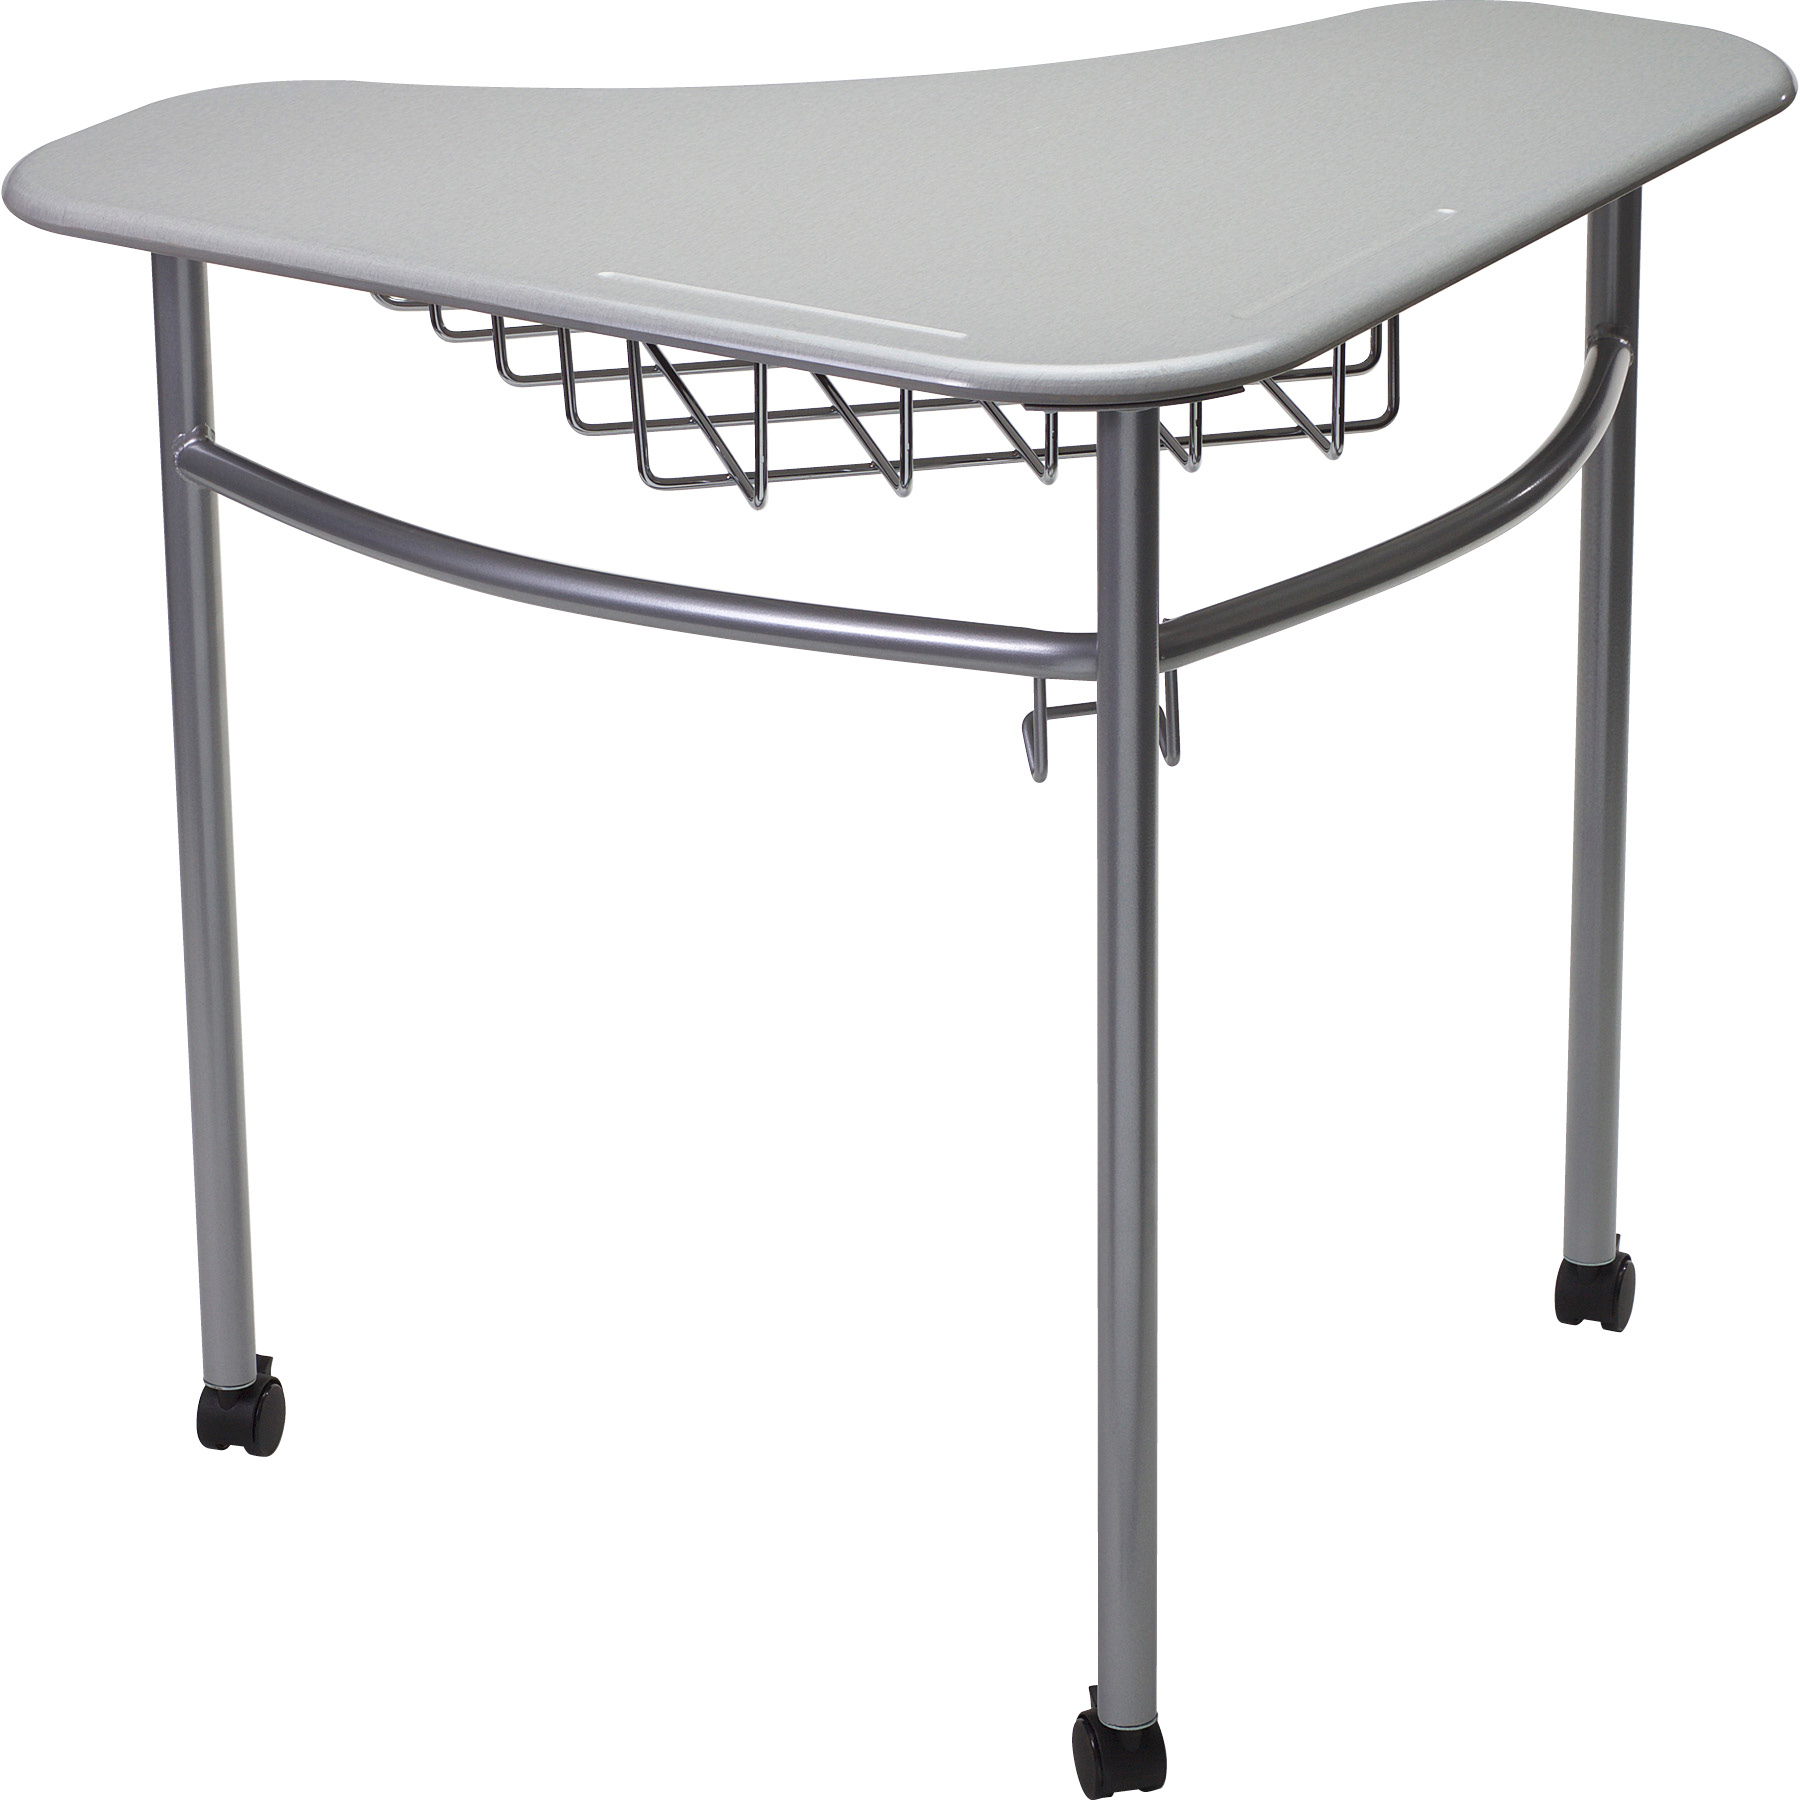 3688 Study Top 3-Leg Desk - Mobile